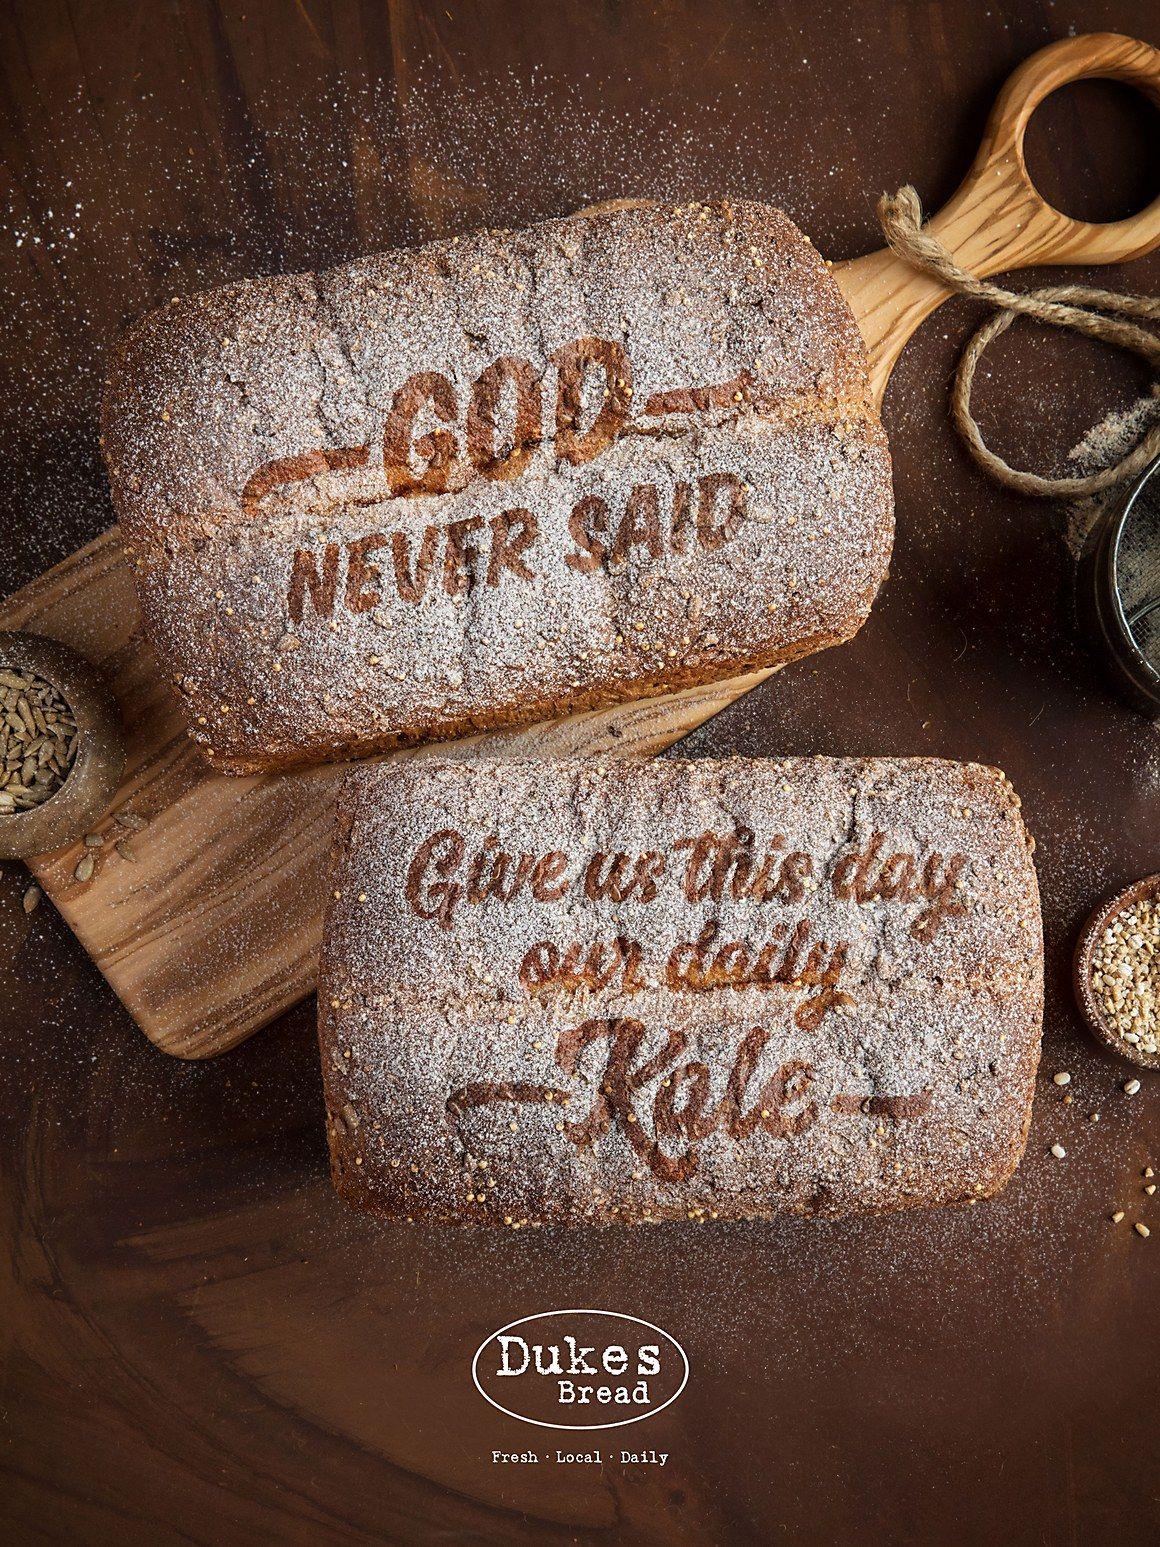 Dukes bread print ads food ads print ads bread brands